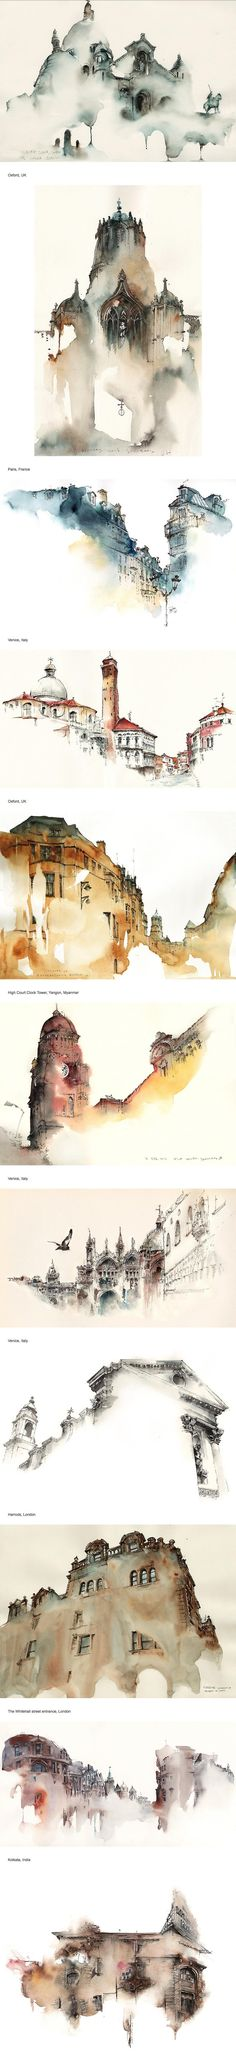 Acuarelas arquitectónicas del artista Sunga Park (Corea)